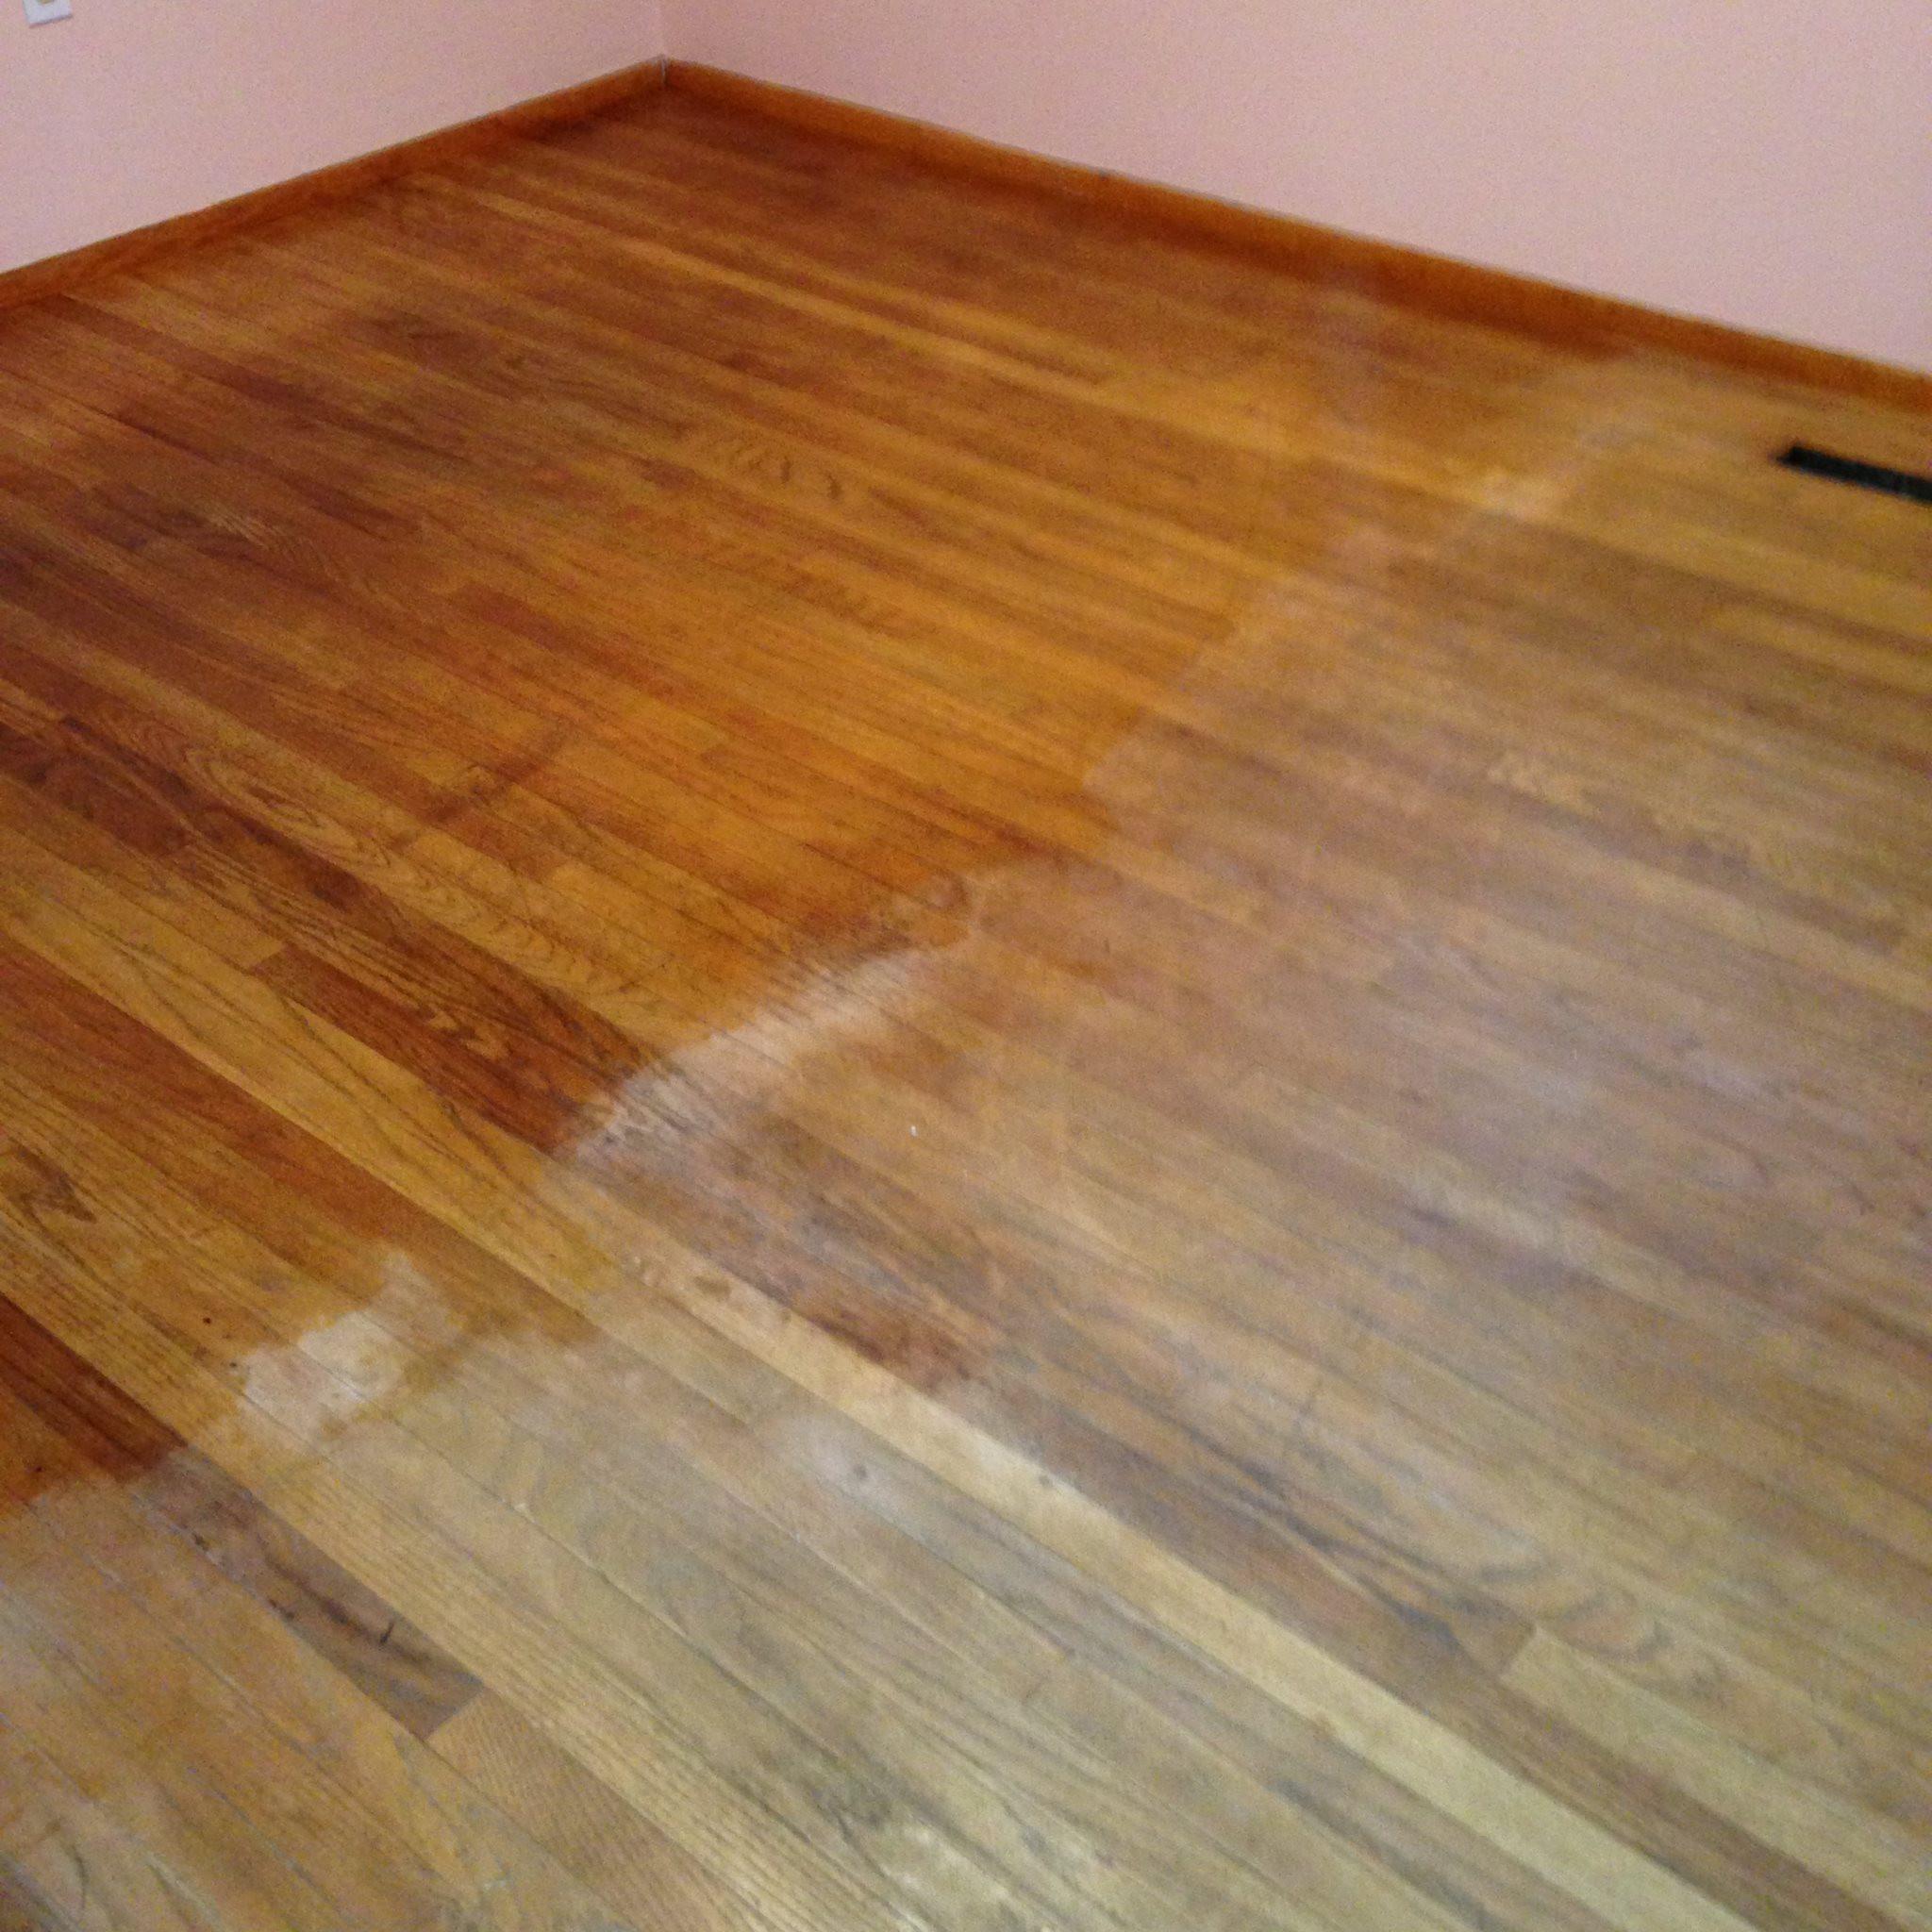 hardwood floor protectors for beds of 15 wood floor hacks every homeowner needs to know intended for wood floor hacks 15